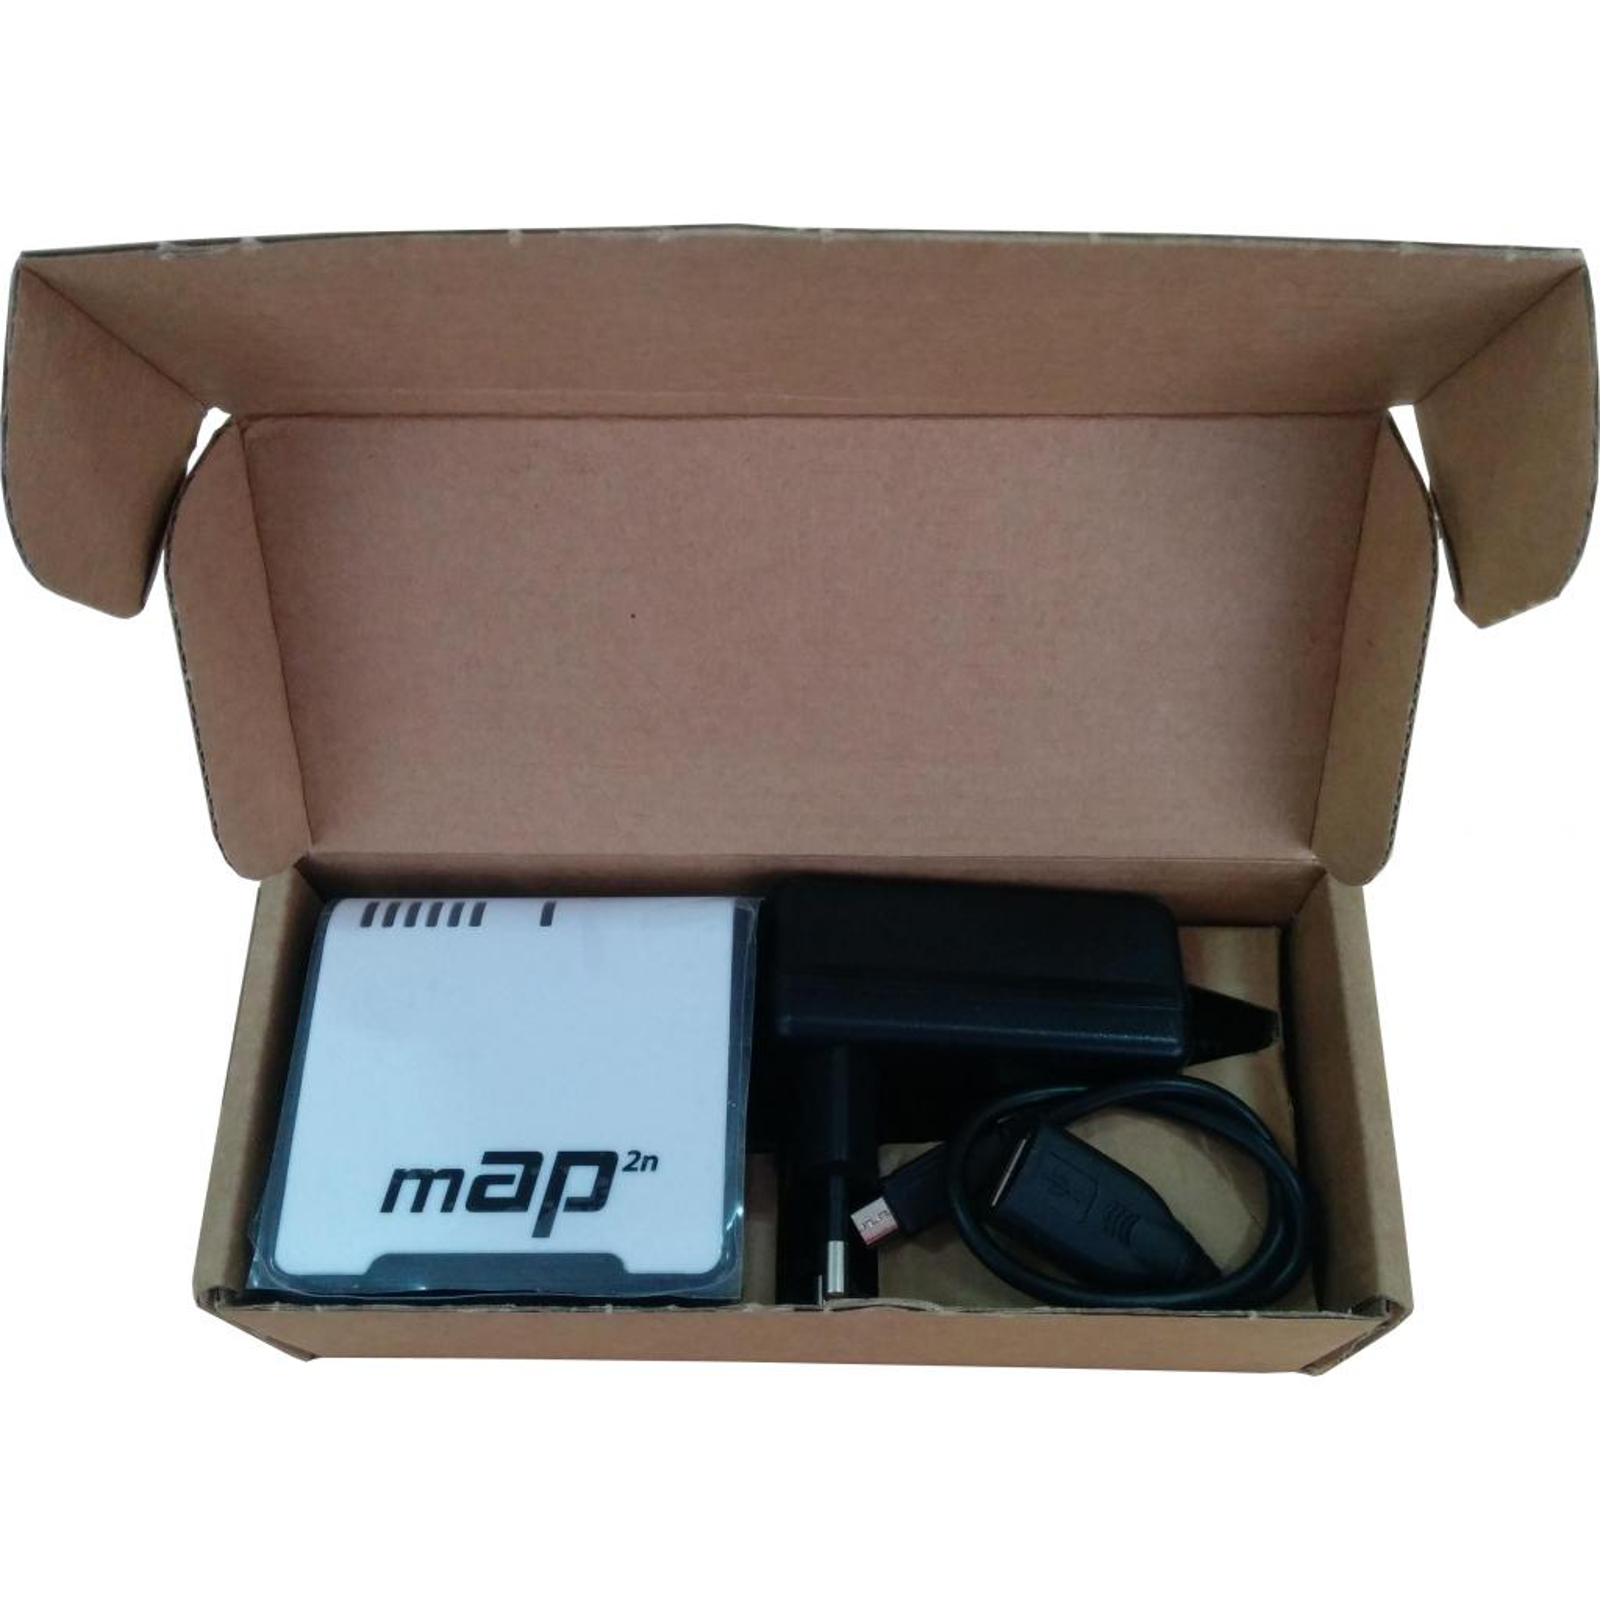 Точка доступа Wi-Fi Mikrotik RBmAP2n изображение 9